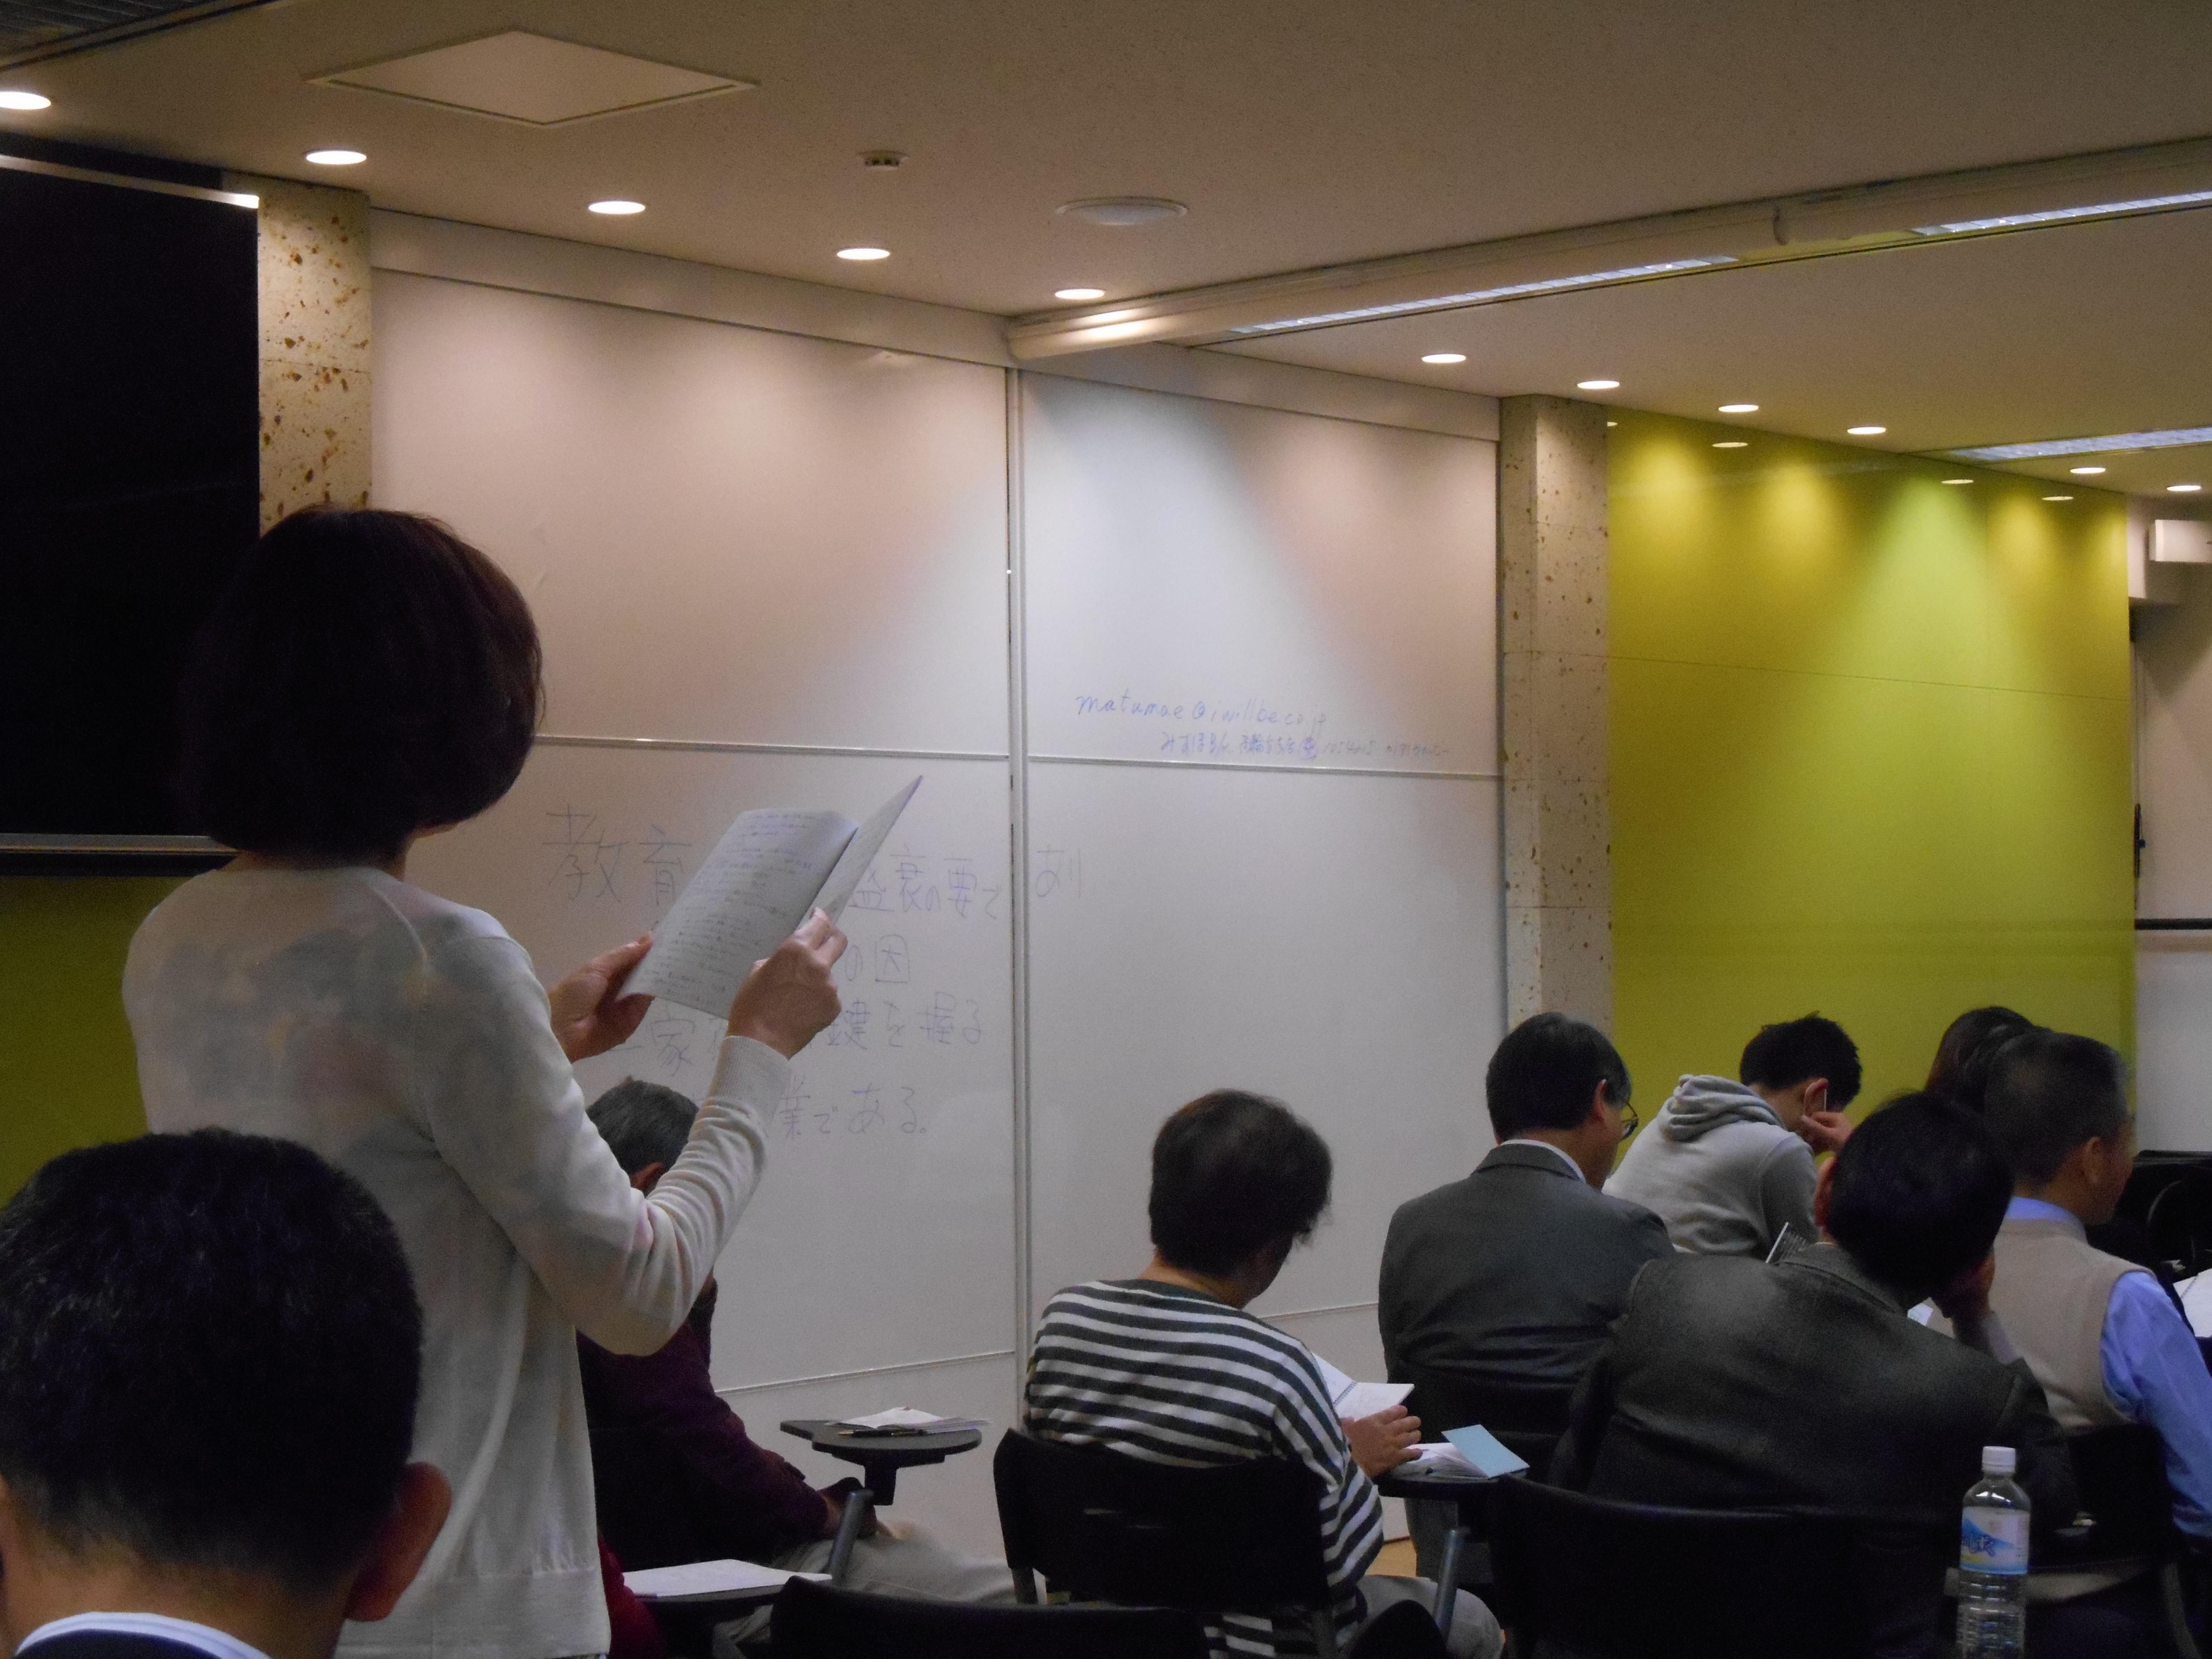 DSCN3730 1 - 4月1日東京思風塾の開催になります。